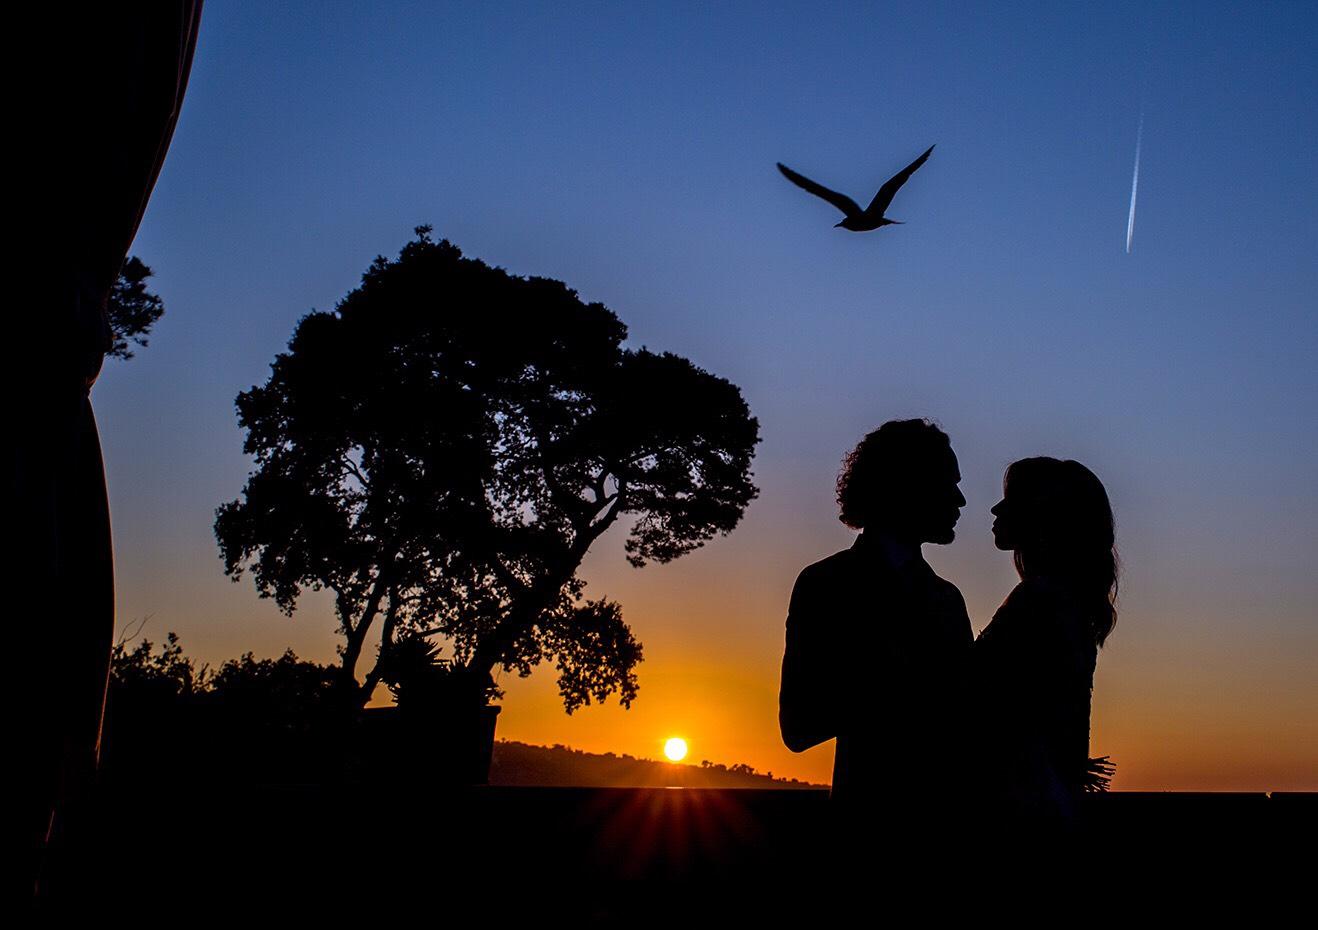 Wedding Experience con storytelling, poesie, cartoline dalla penisola sorrentina, matrimonio eco-friendly e filosofia wabi-sabi